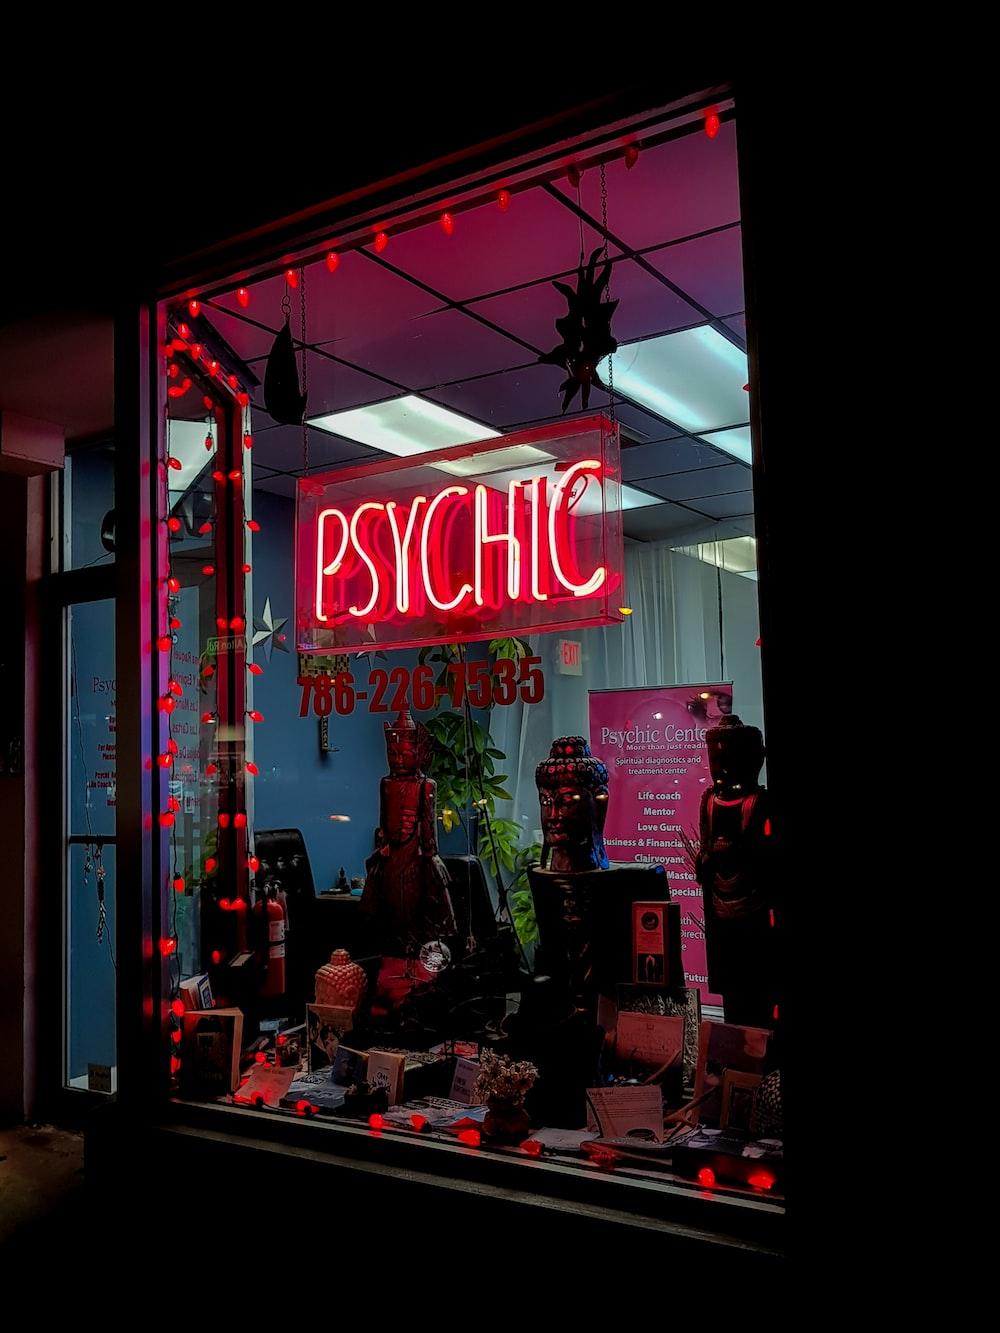 Pyschic store at nighttime